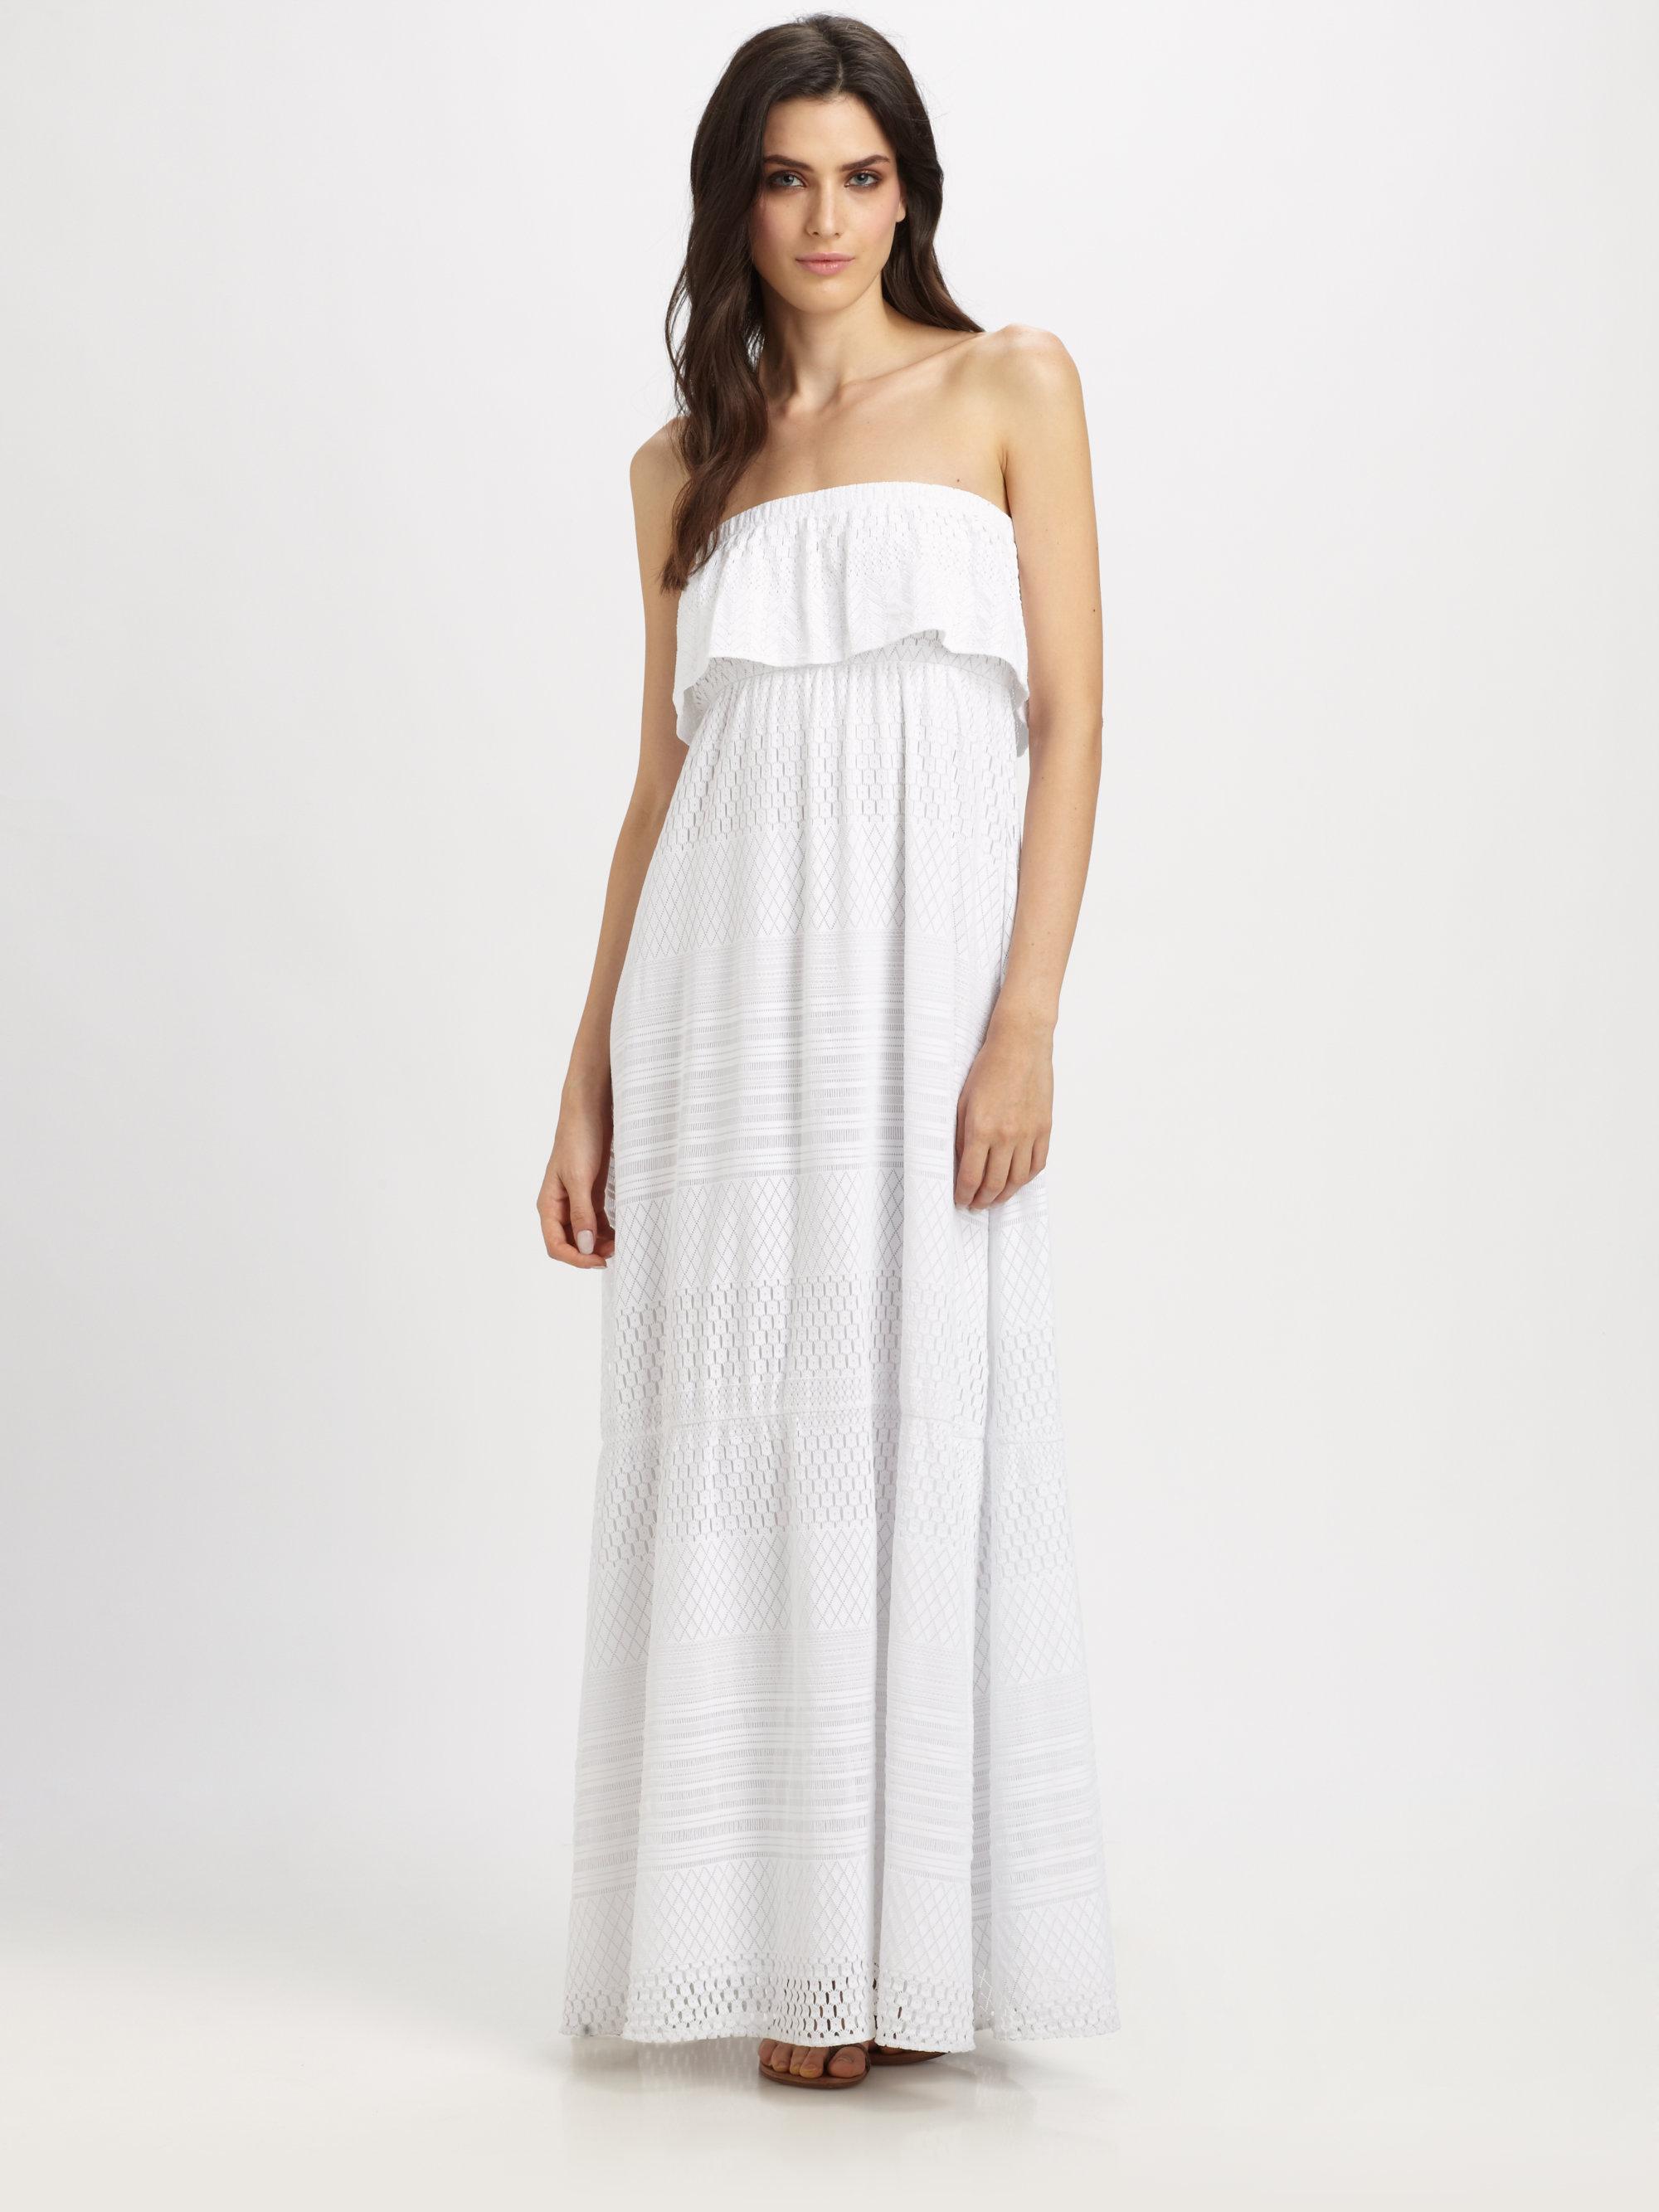 Lyst Melissa Odabash Crochet Strapless Maxi Dress In White